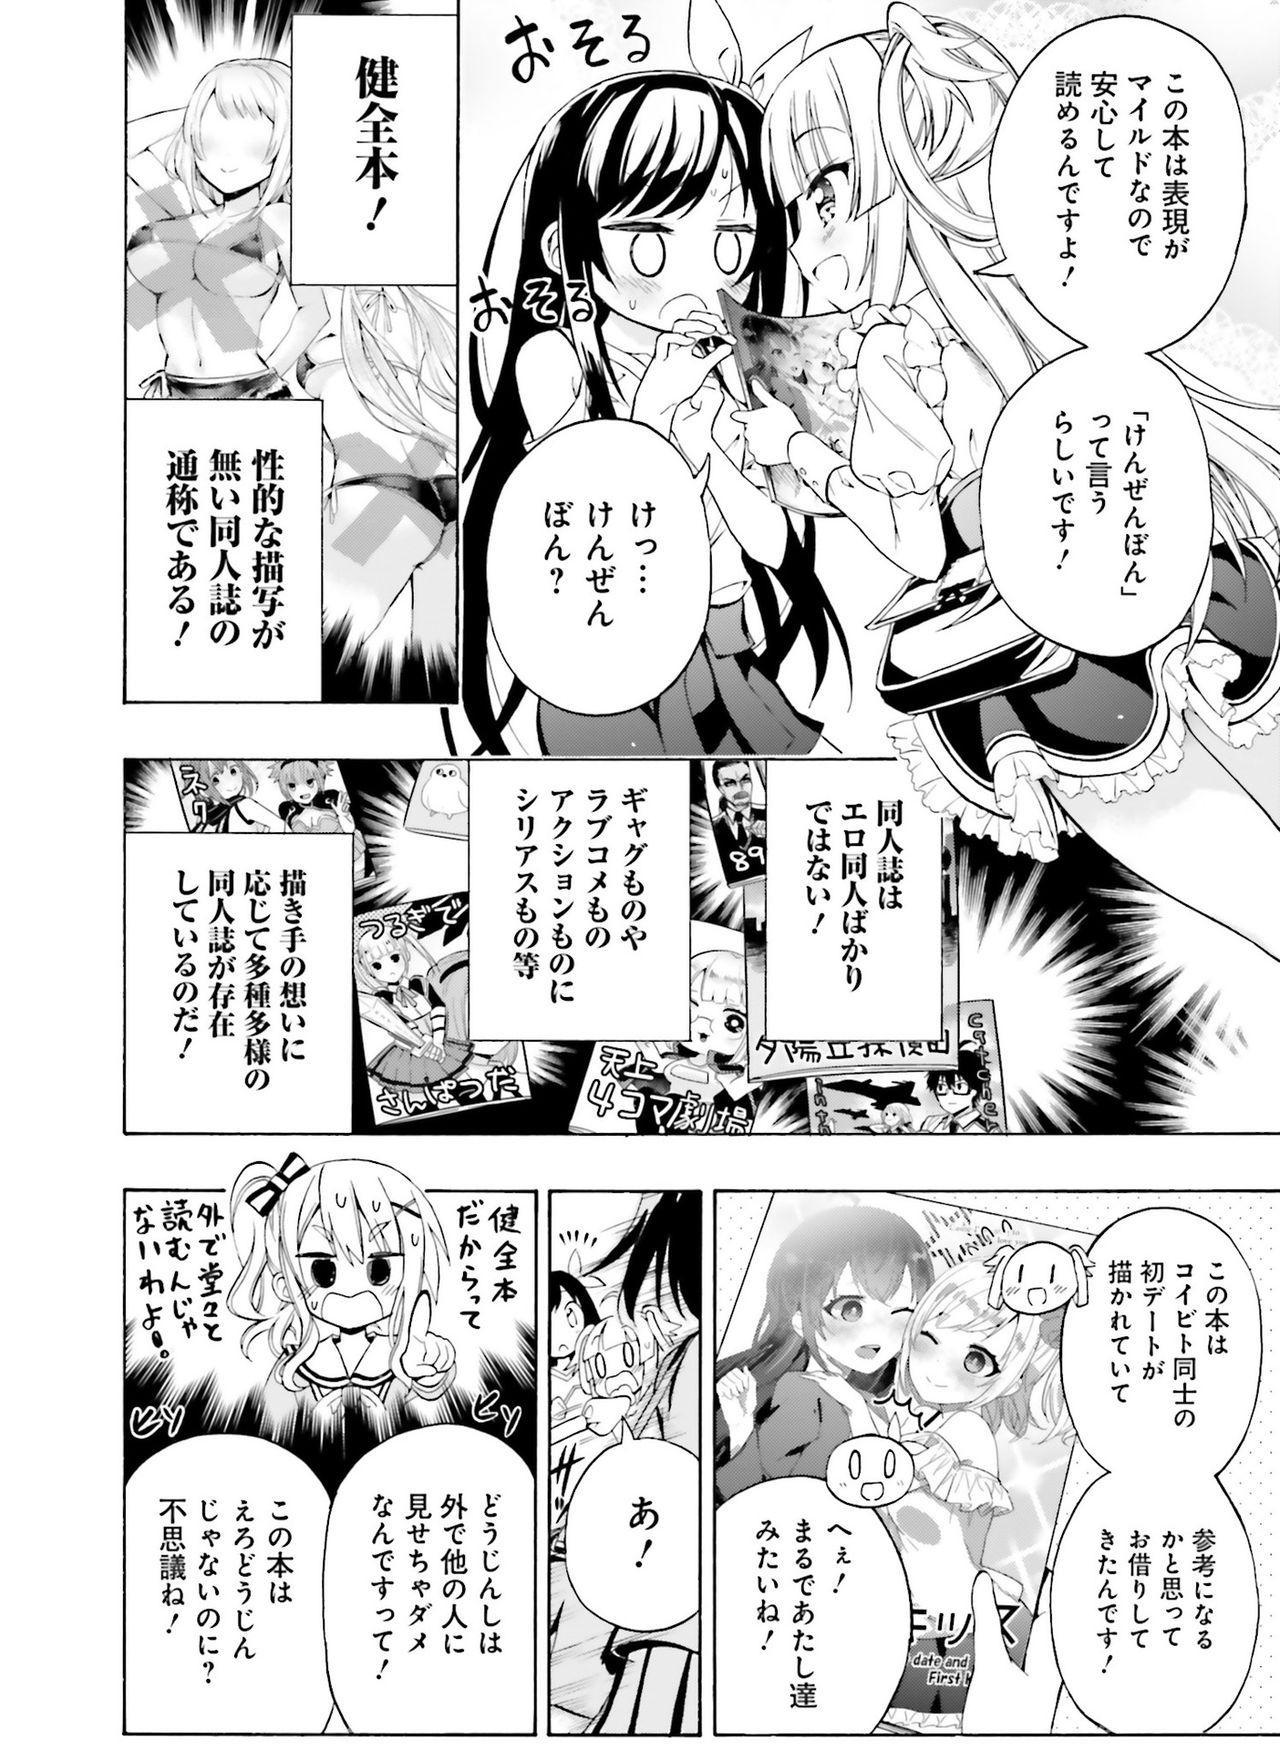 Dengeki Moeoh 2019-04 114